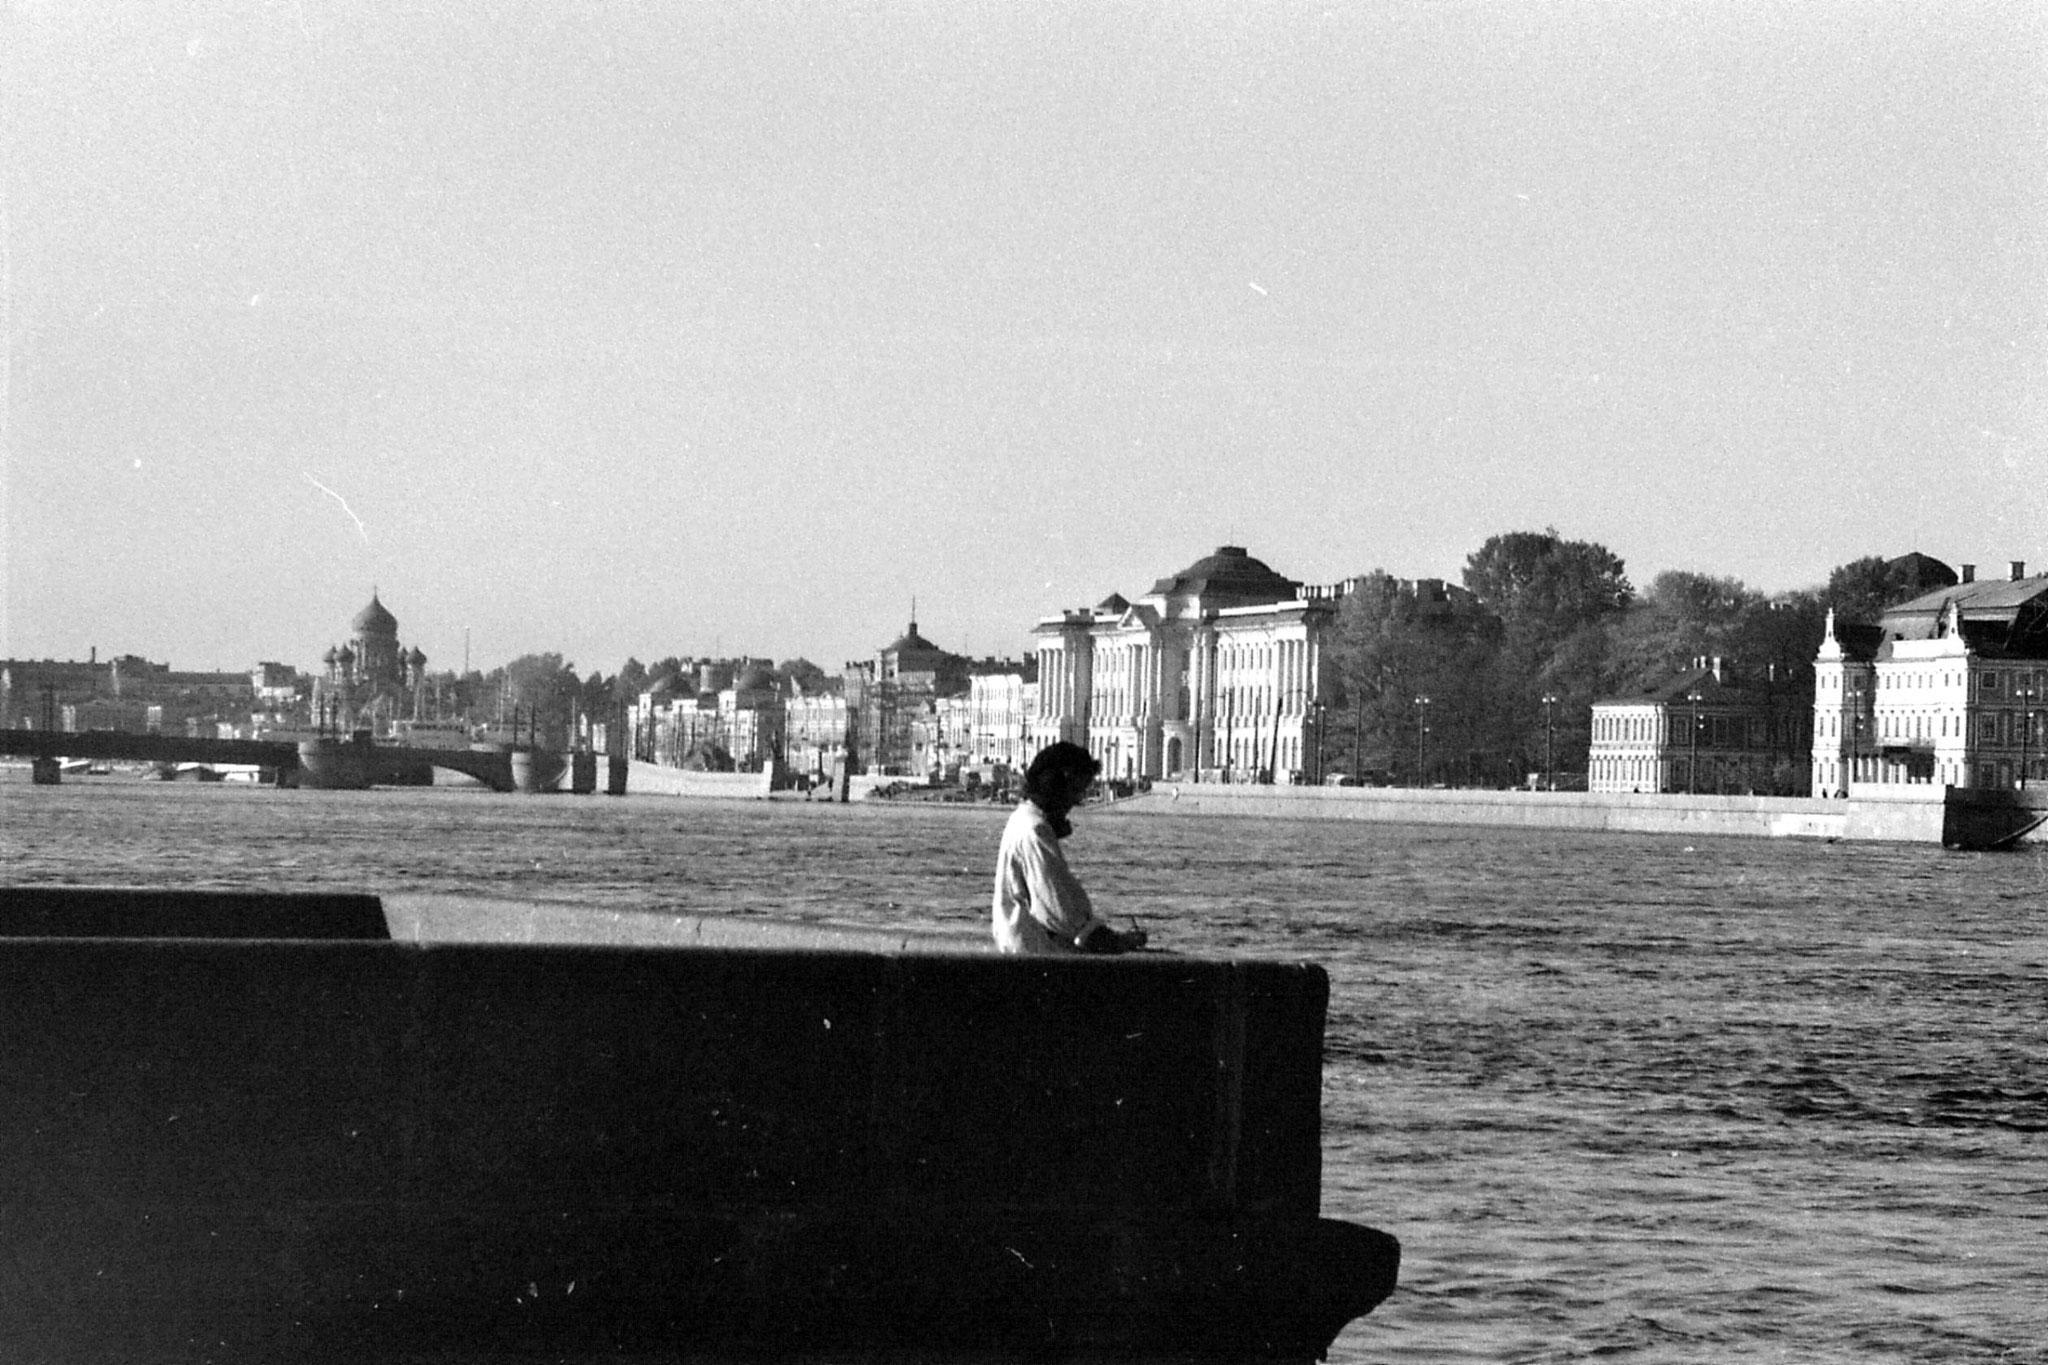 13/10/1988: 7: west along River neva